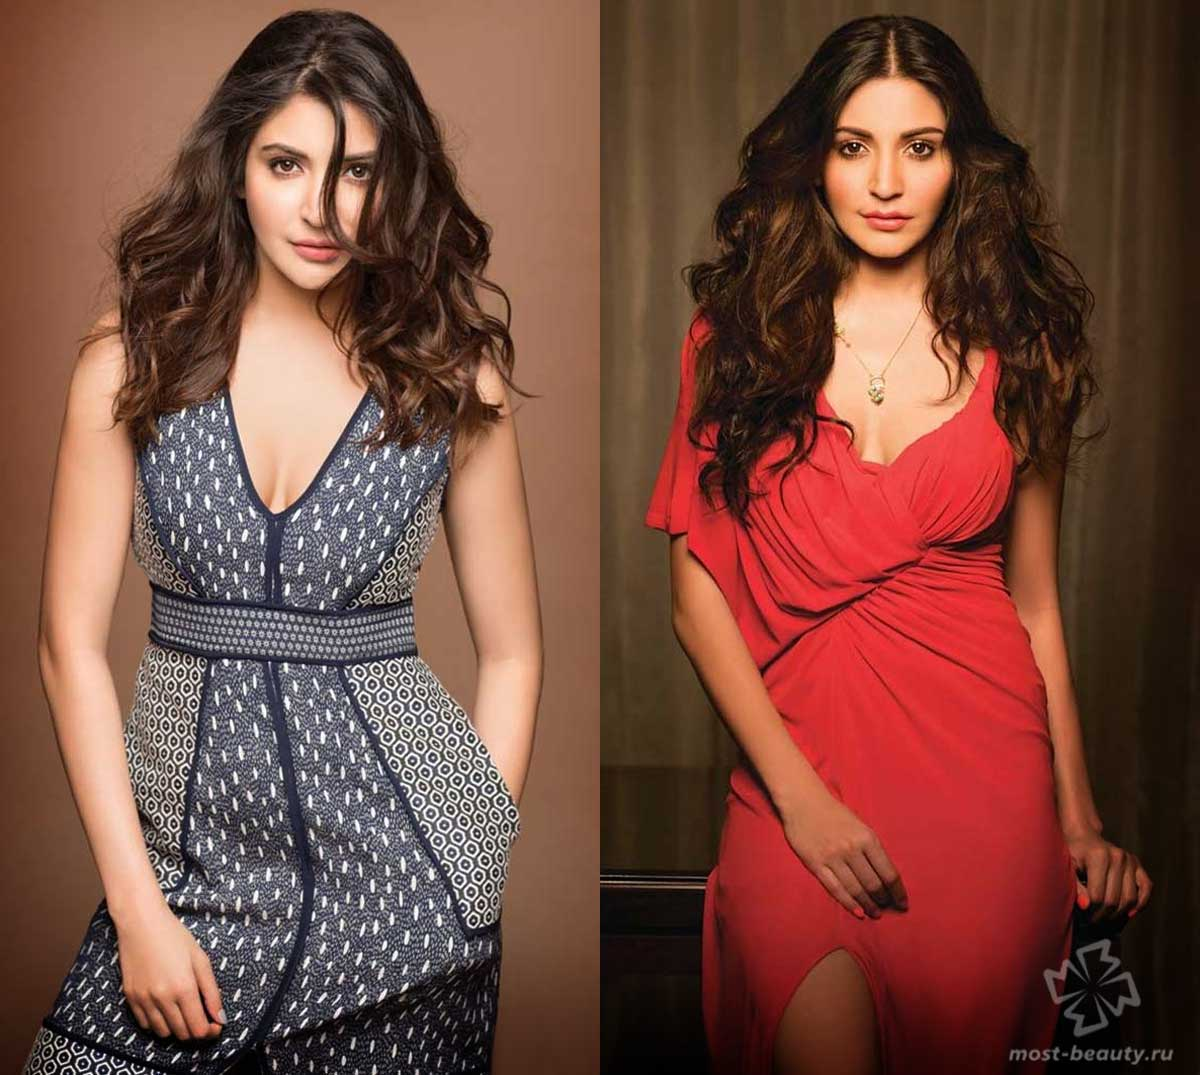 Самые красивые актрисы Болливуда: Анушка Шарма (Anushka Sharma)